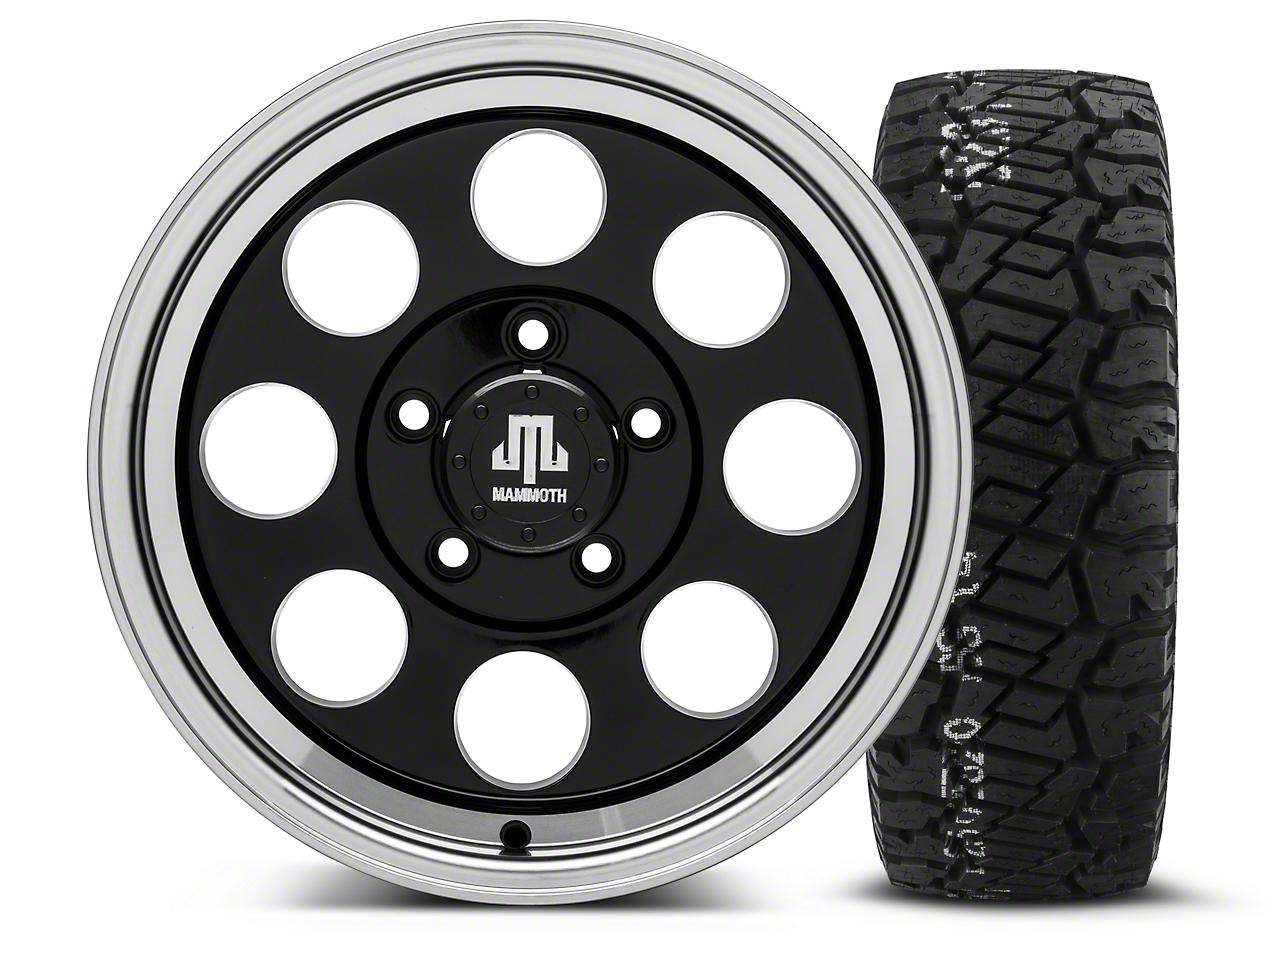 Mammoth 8 Black - 16x8 Wheel - and BF Goodrich All Terrain TA KO2 Tire - 315/75R16 (07-18 Jeep Wrangler JK; 2018 Jeep Wrangler JL)